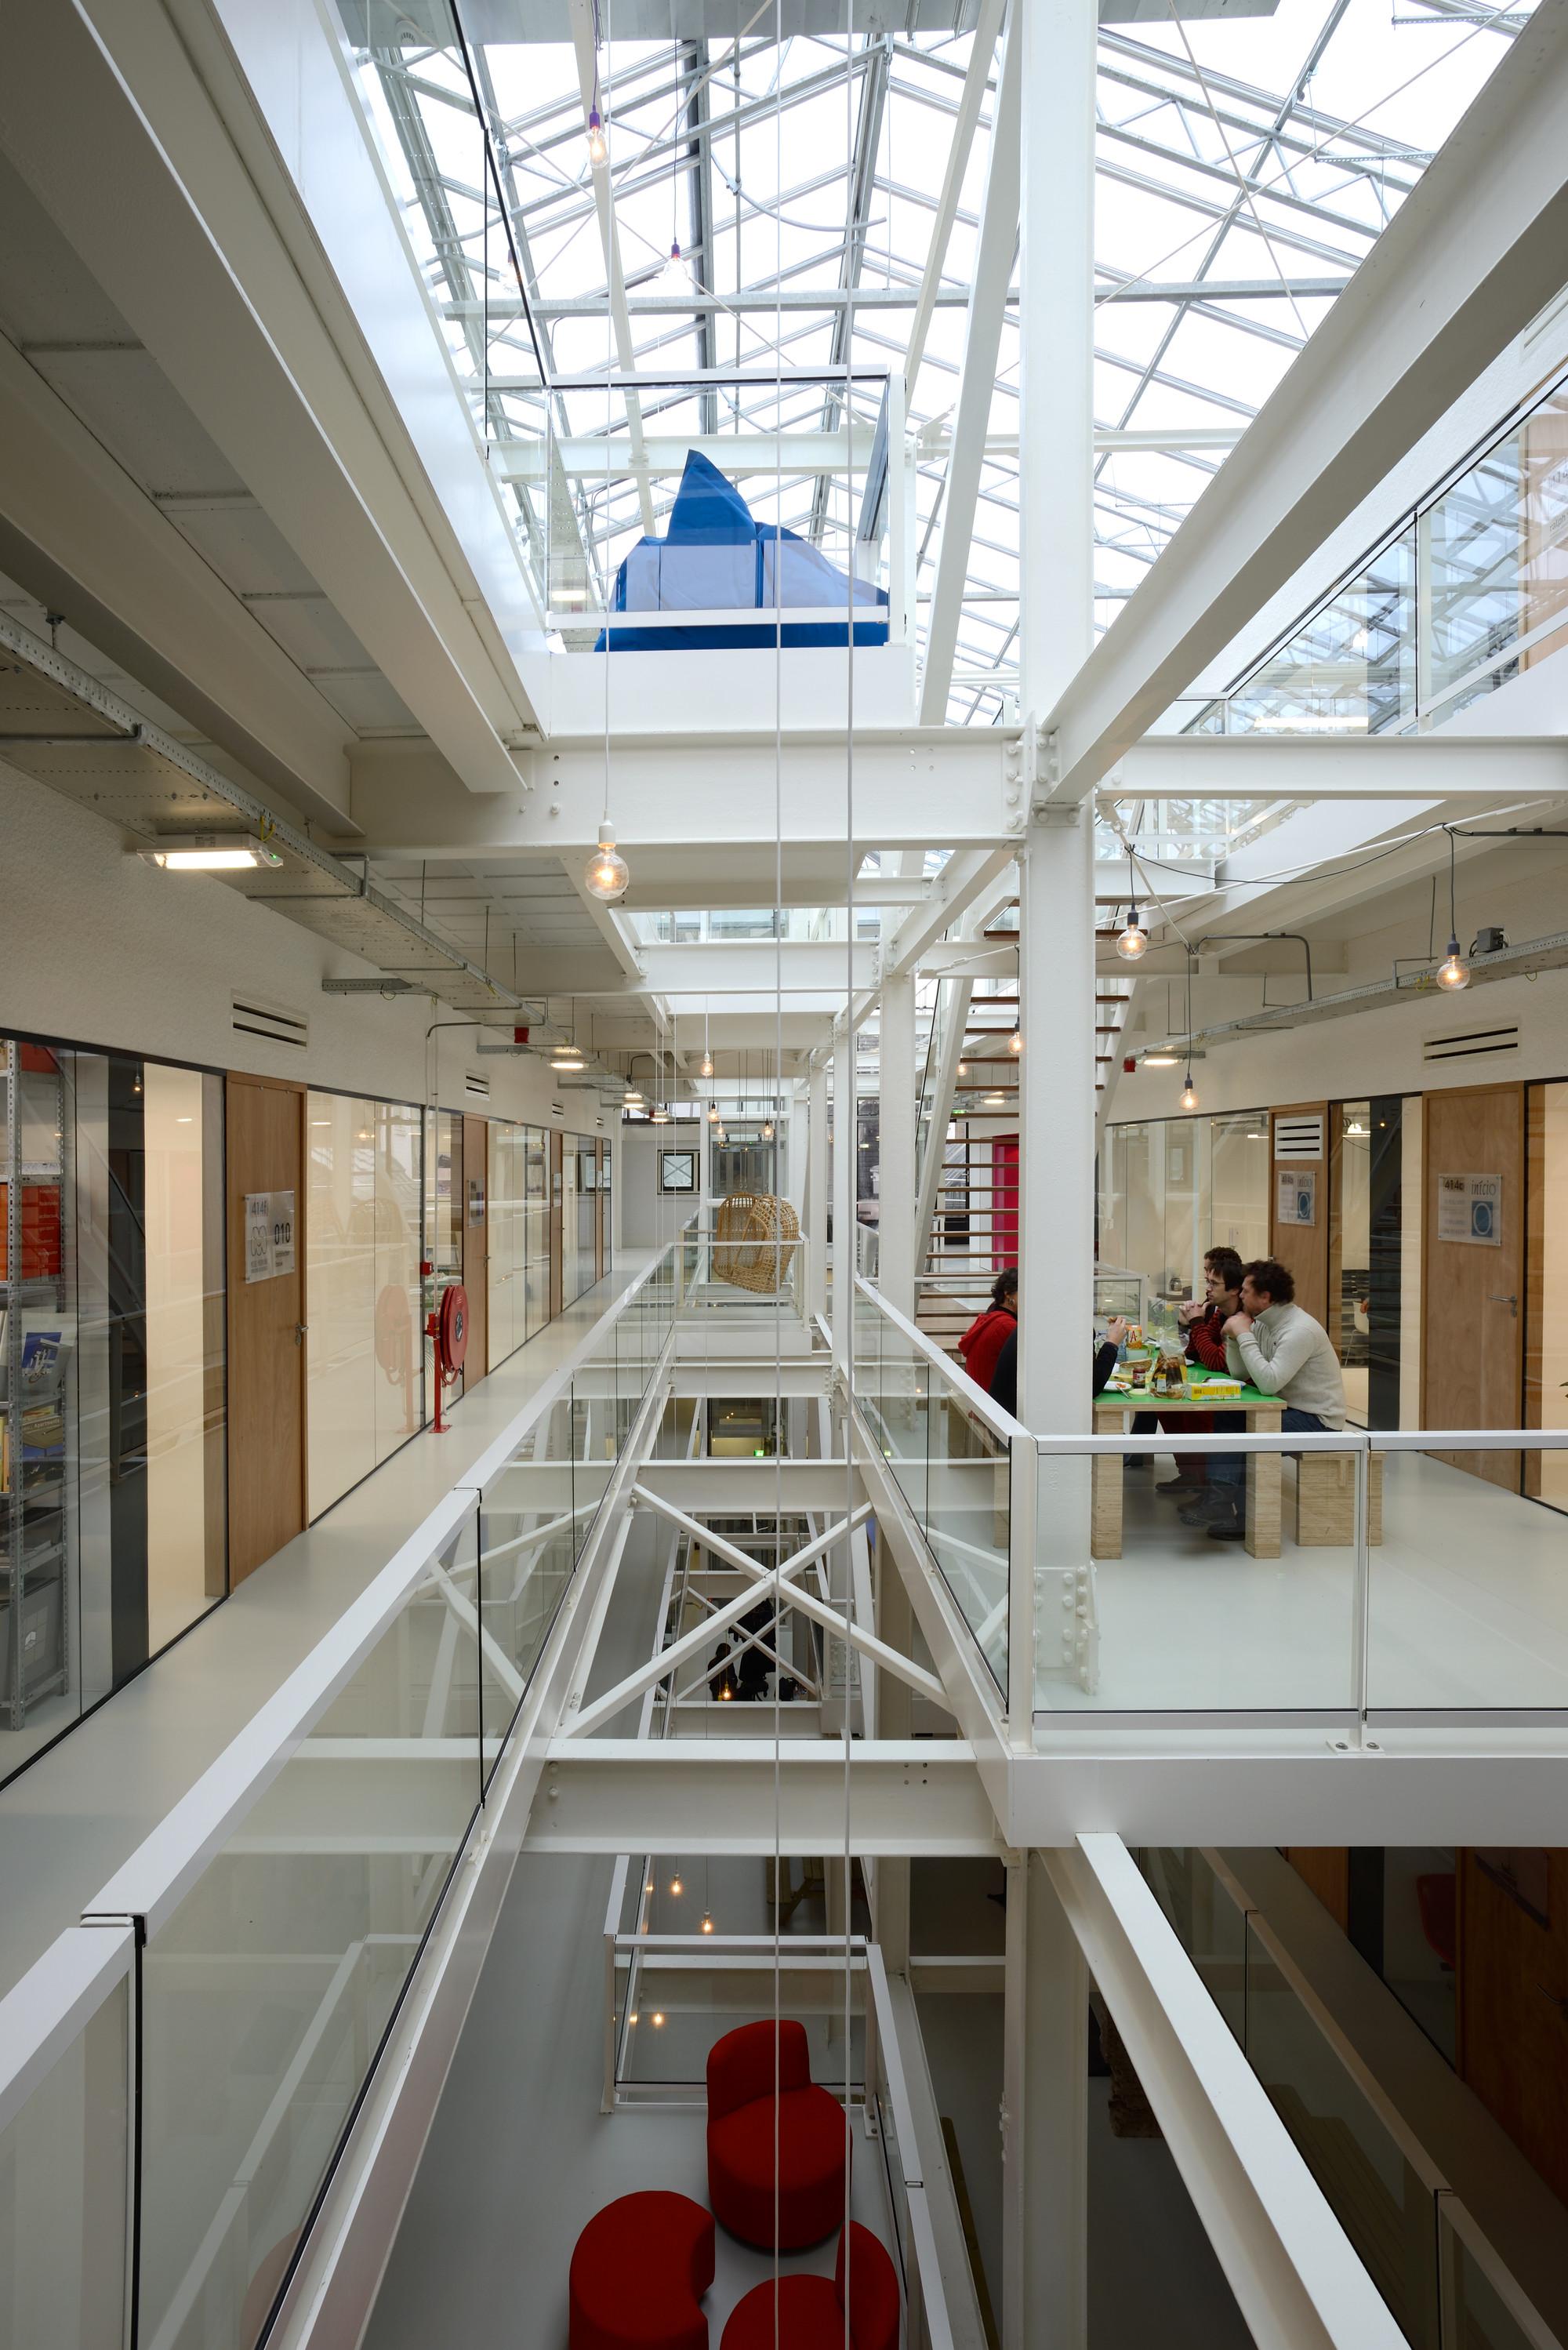 De fabriek in rotterdam mei architecten en stedenbouwers for Architect interieur